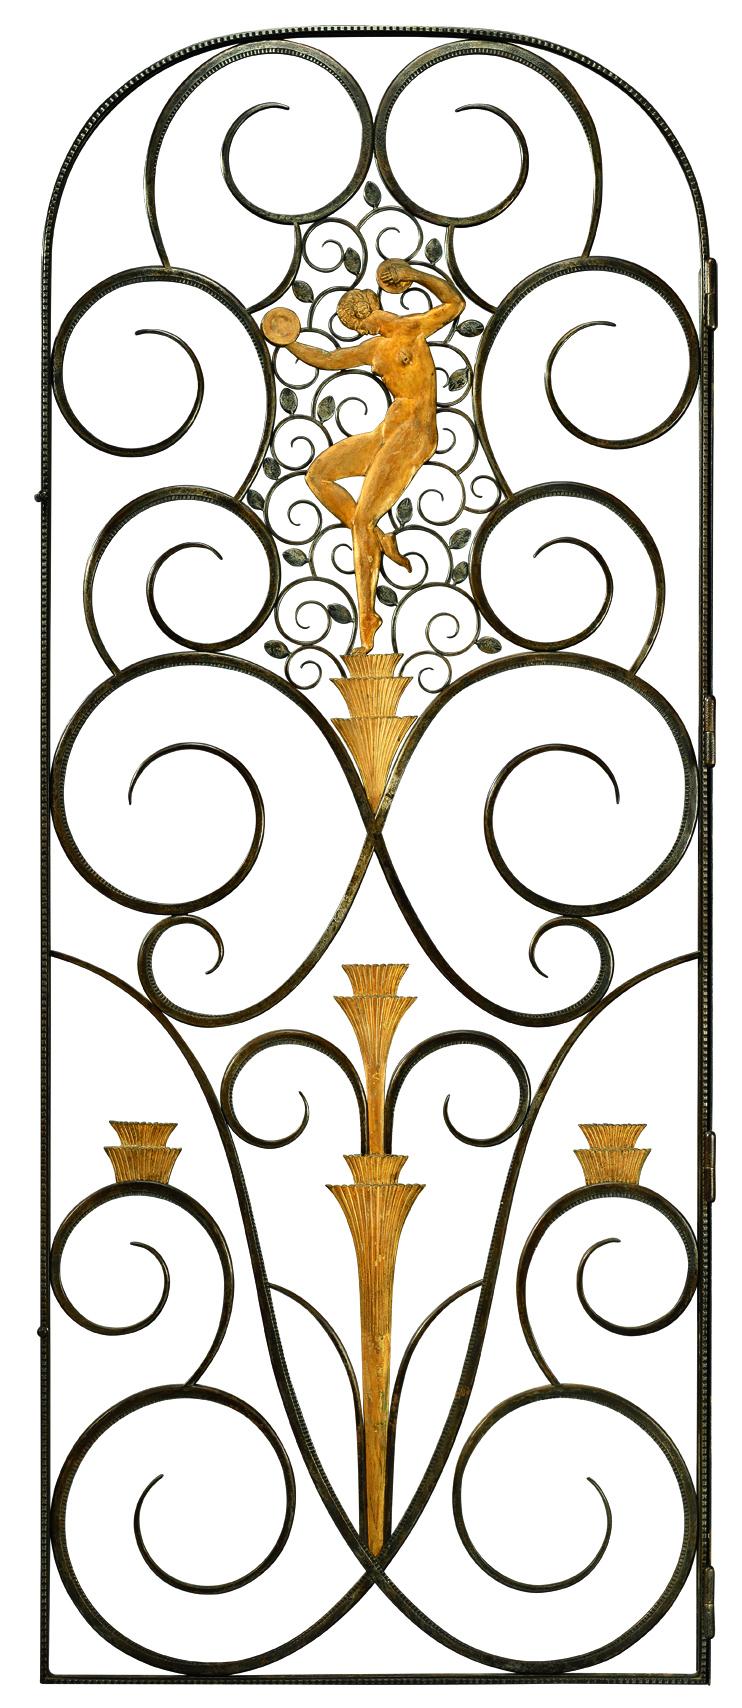 Wrought iron gate by Edgar Brandt (1880-1960)